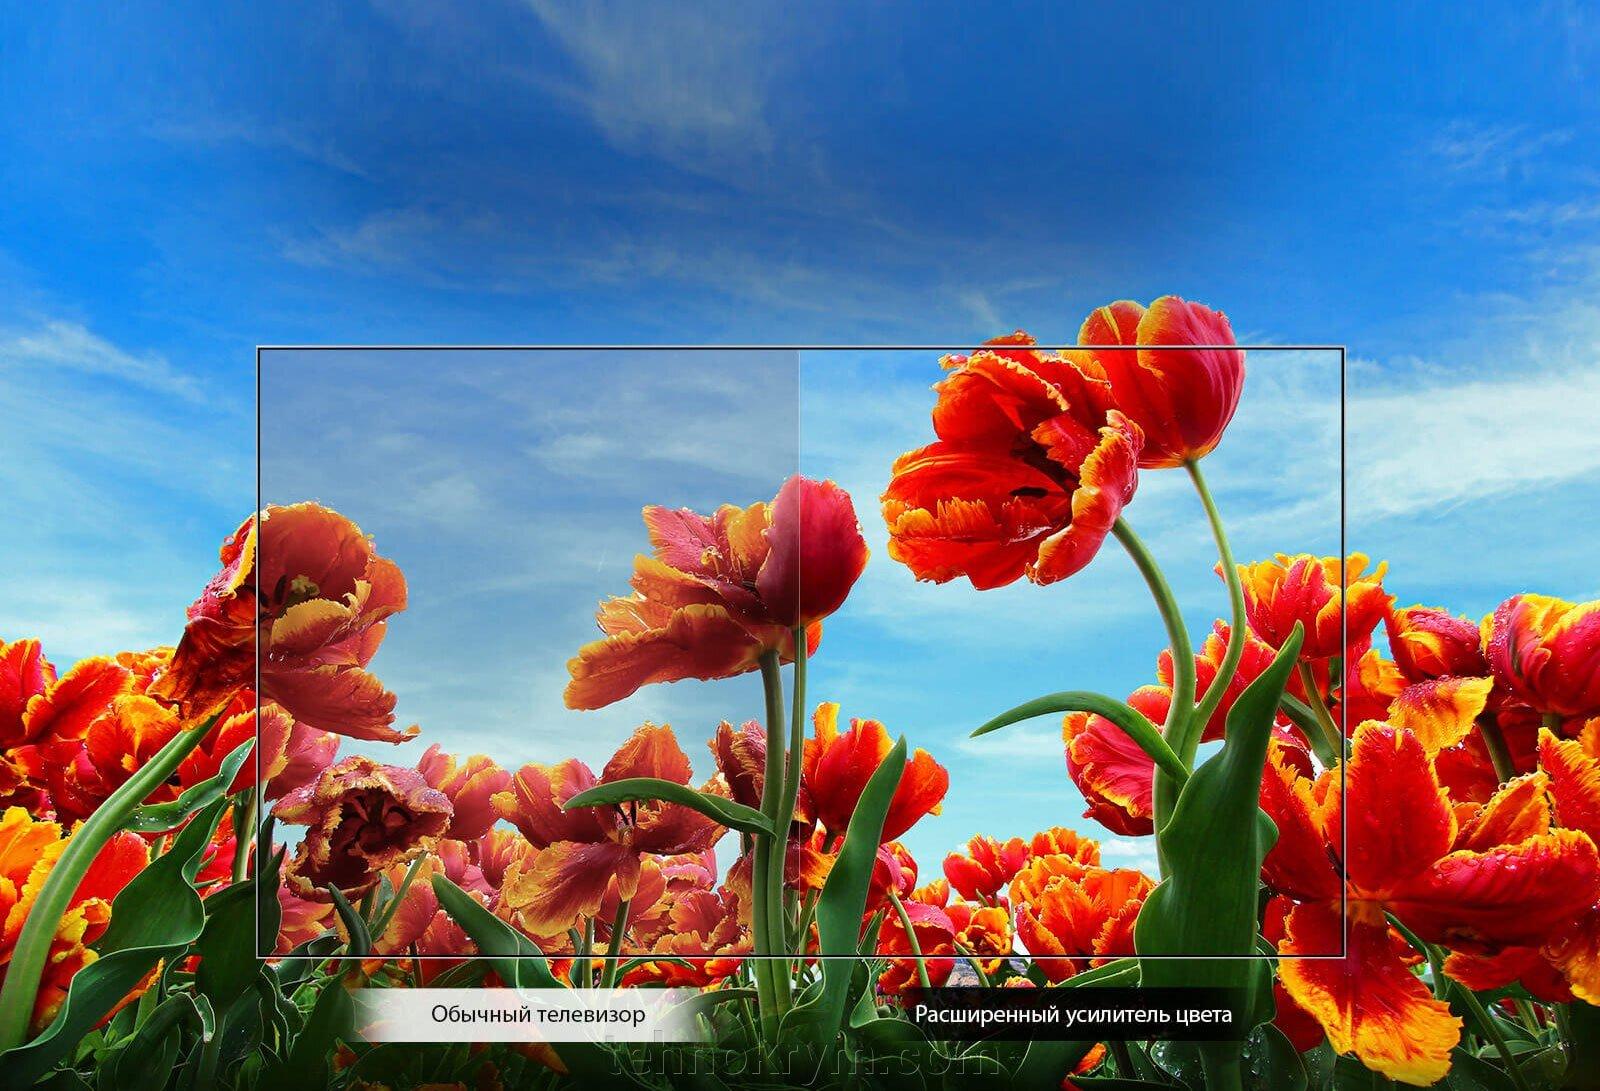 Телевизор LG 32LM550BPLB со встроенным тюнером Т2 - фото pic_9e9d93d888c4c0e4a1a4a6796e1666fa_1920x9000_1.jpg